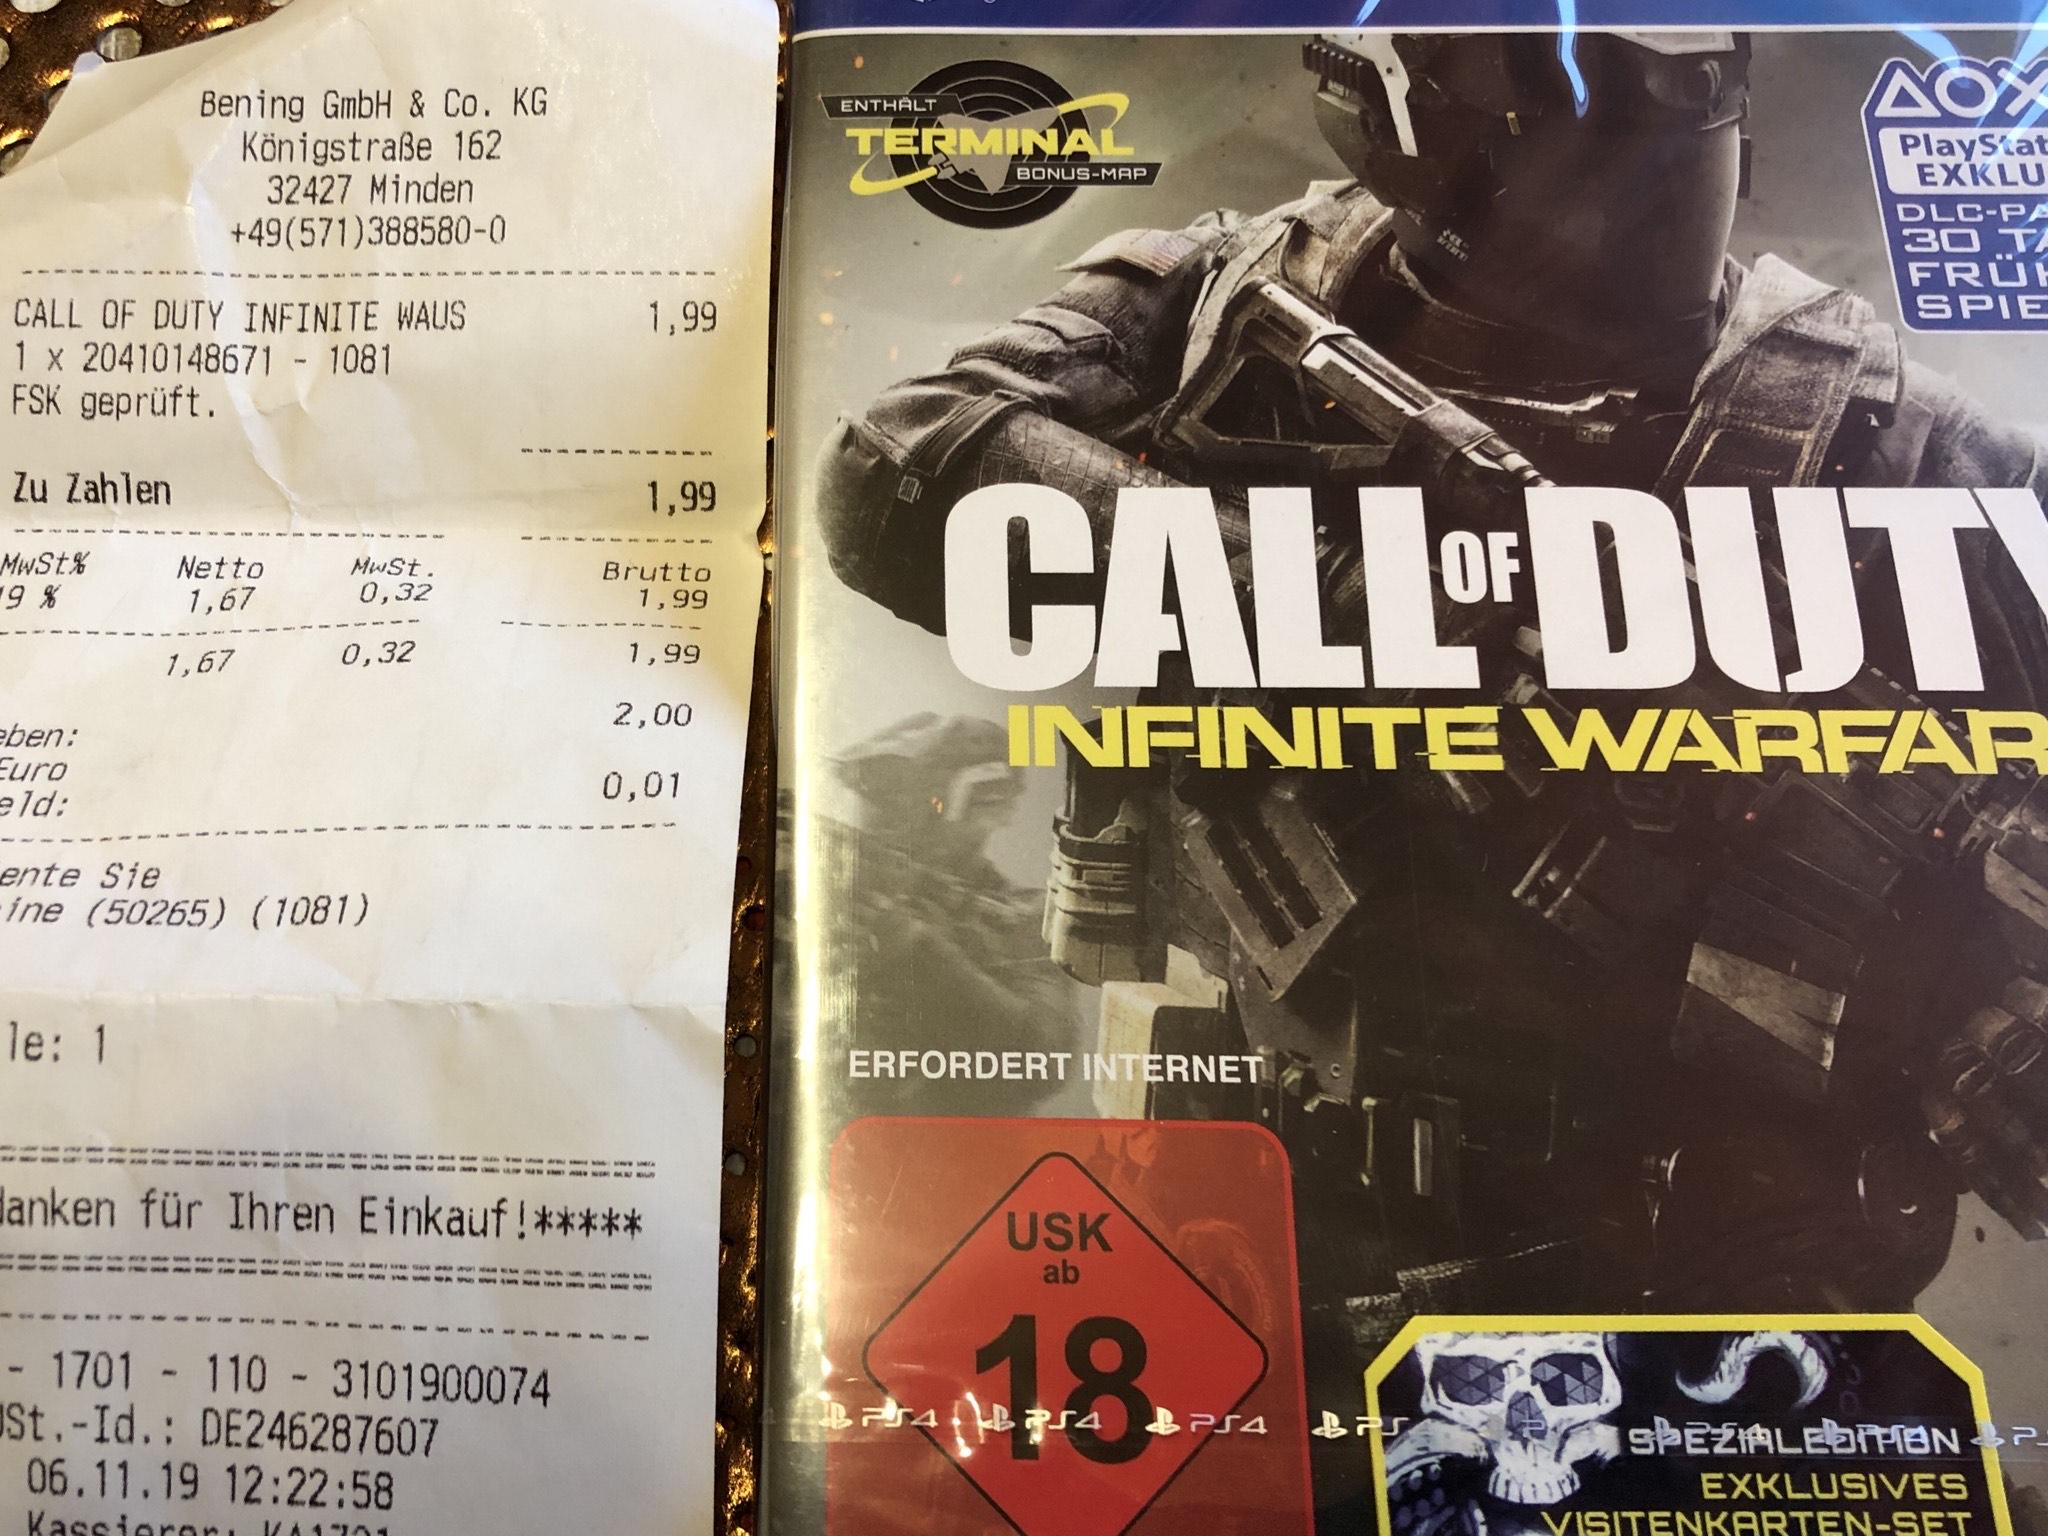 CALL of DUTY infinite warfare (Lokal?) Expert Bening Minden